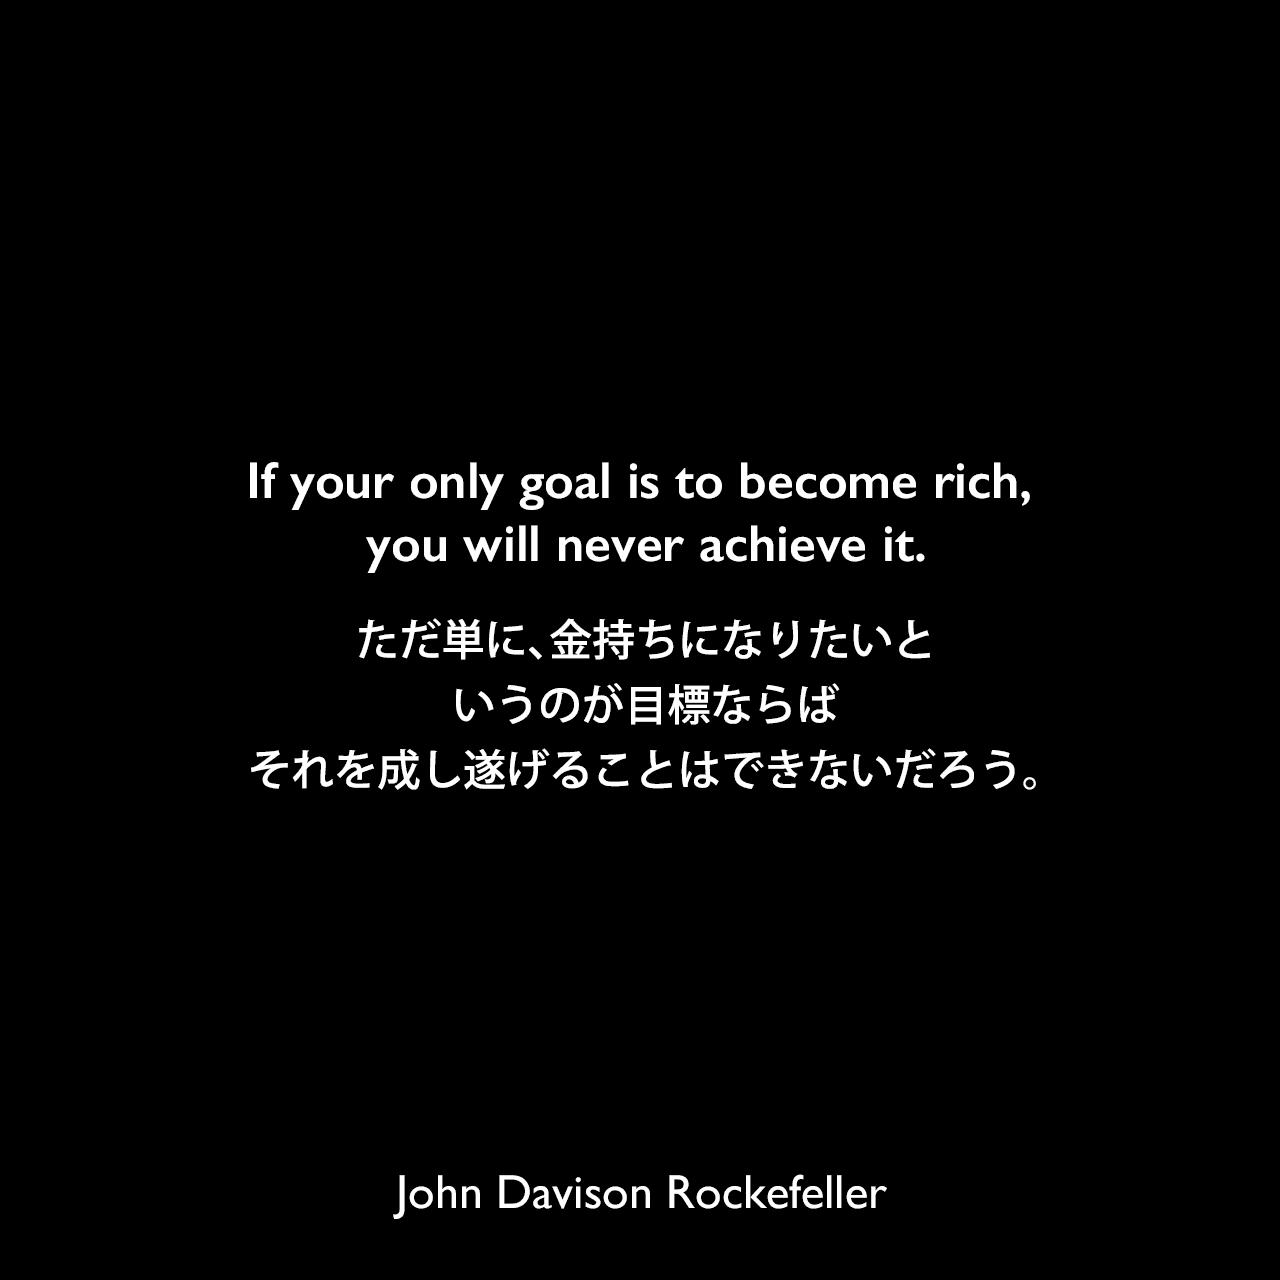 If your only goal is to become rich, you will never achieve it.ただ単に、金持ちになりたいというのが目標ならば、それを成し遂げることはできないだろう。John Davison Rockefeller